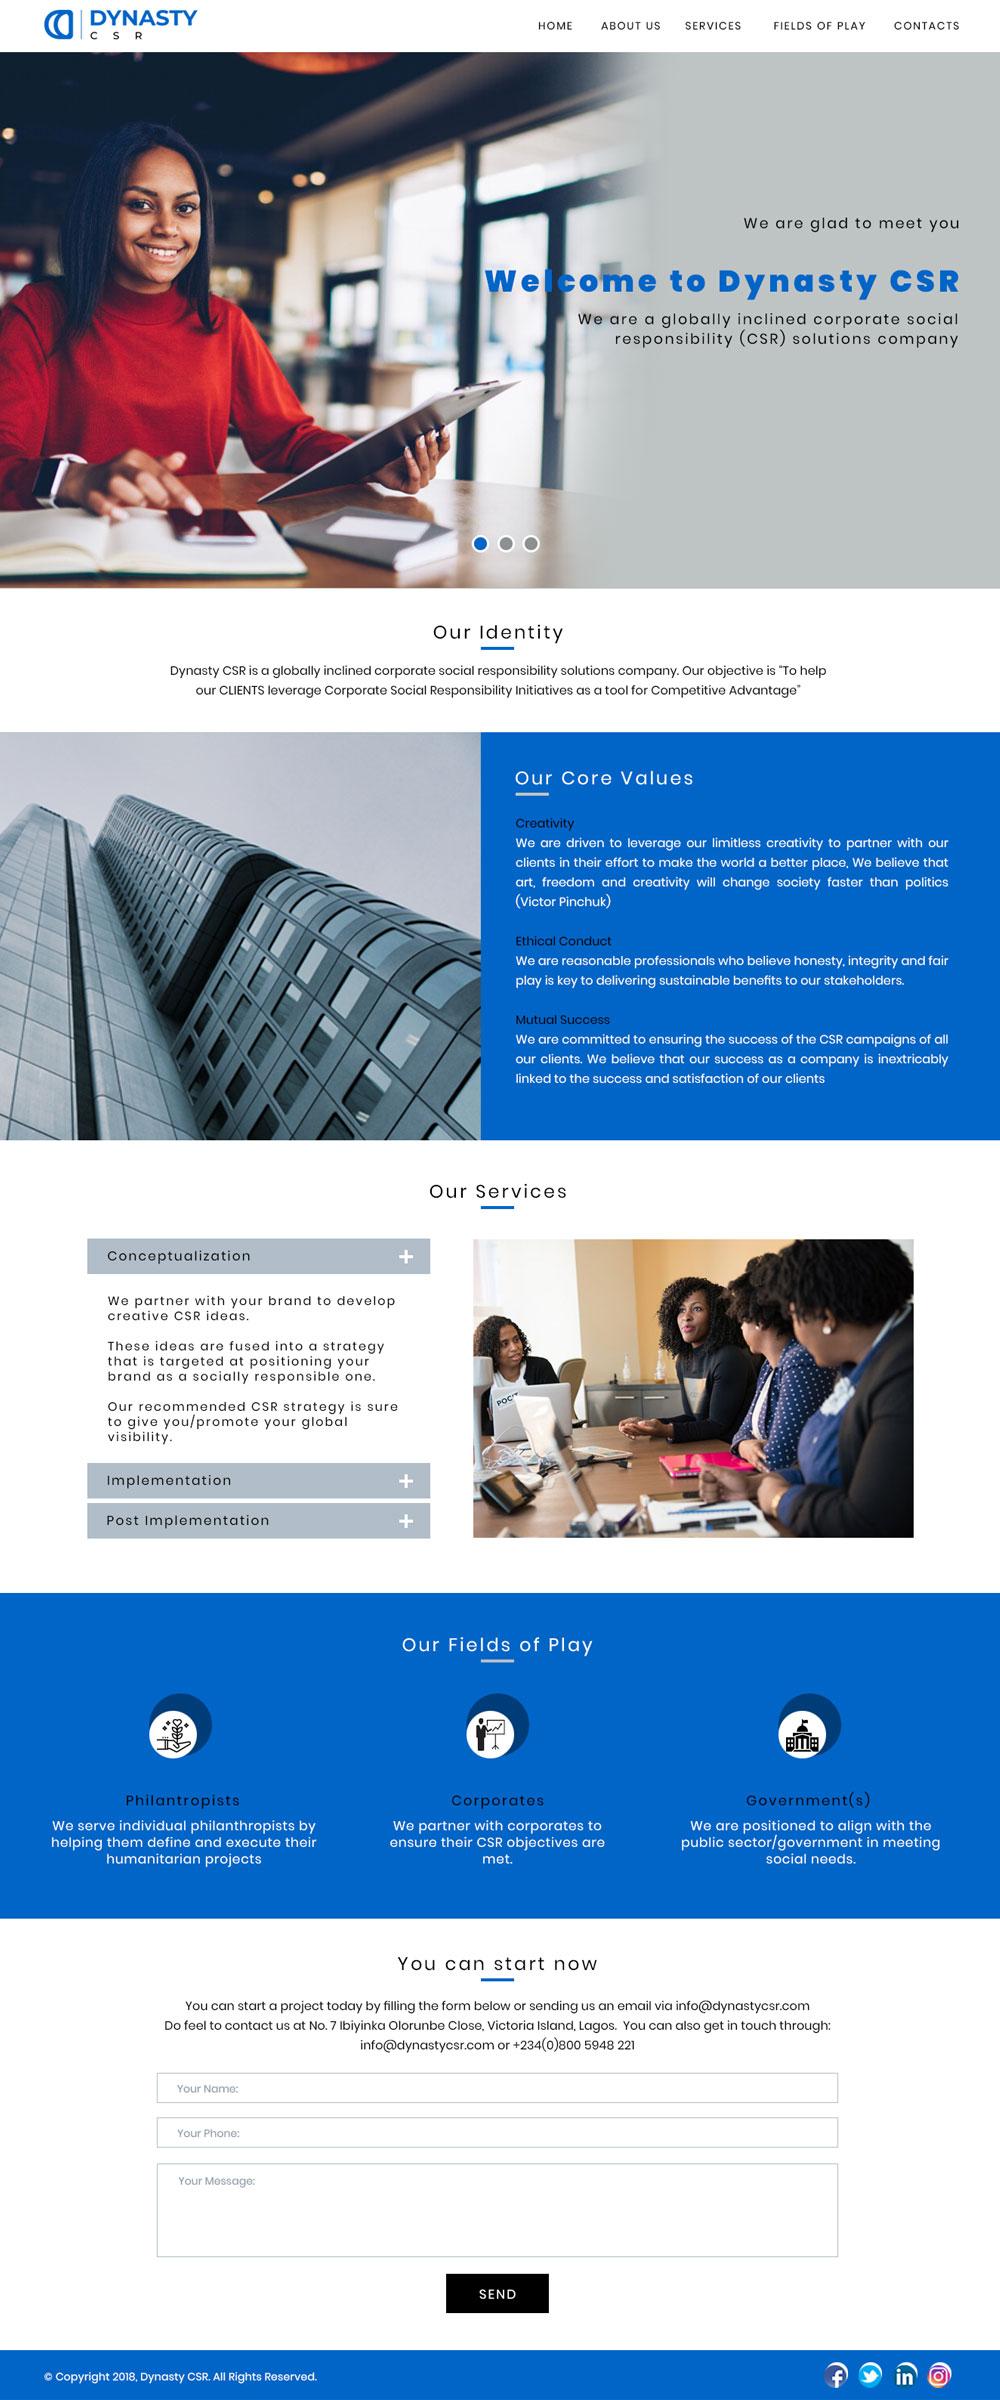 Dynasty CSR Website Design